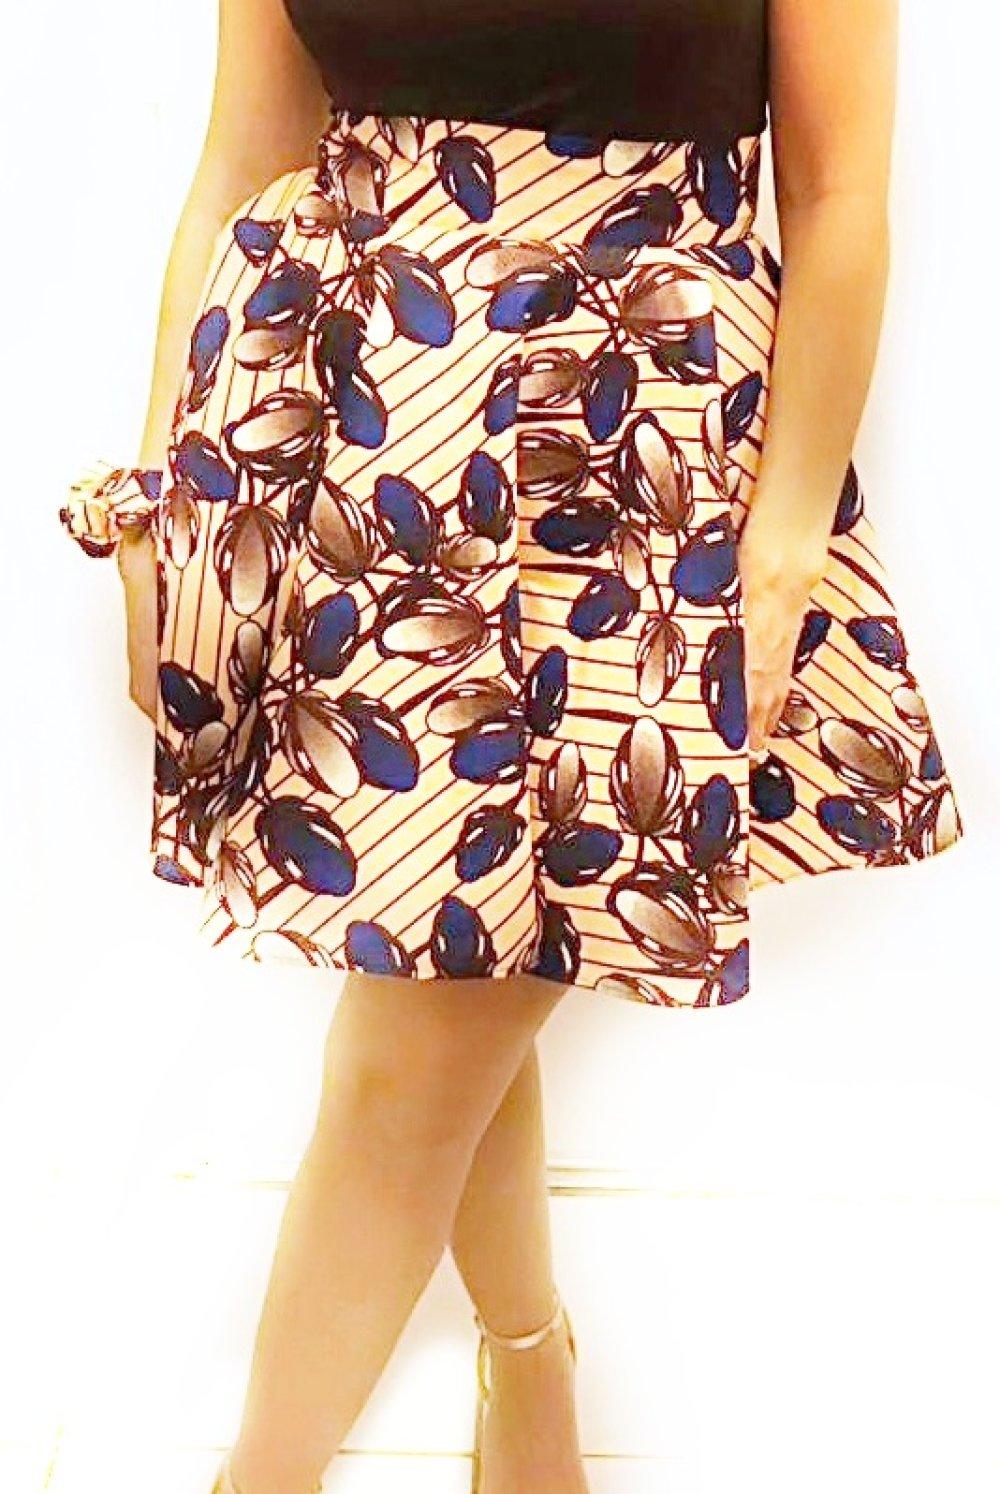 Jupe patineuse-Accessoires-Taille haute-Cloche-ample-Evasée-Corolle-midi-accessoires-Skater skirt-Bell-Ample skirt,Skirt women